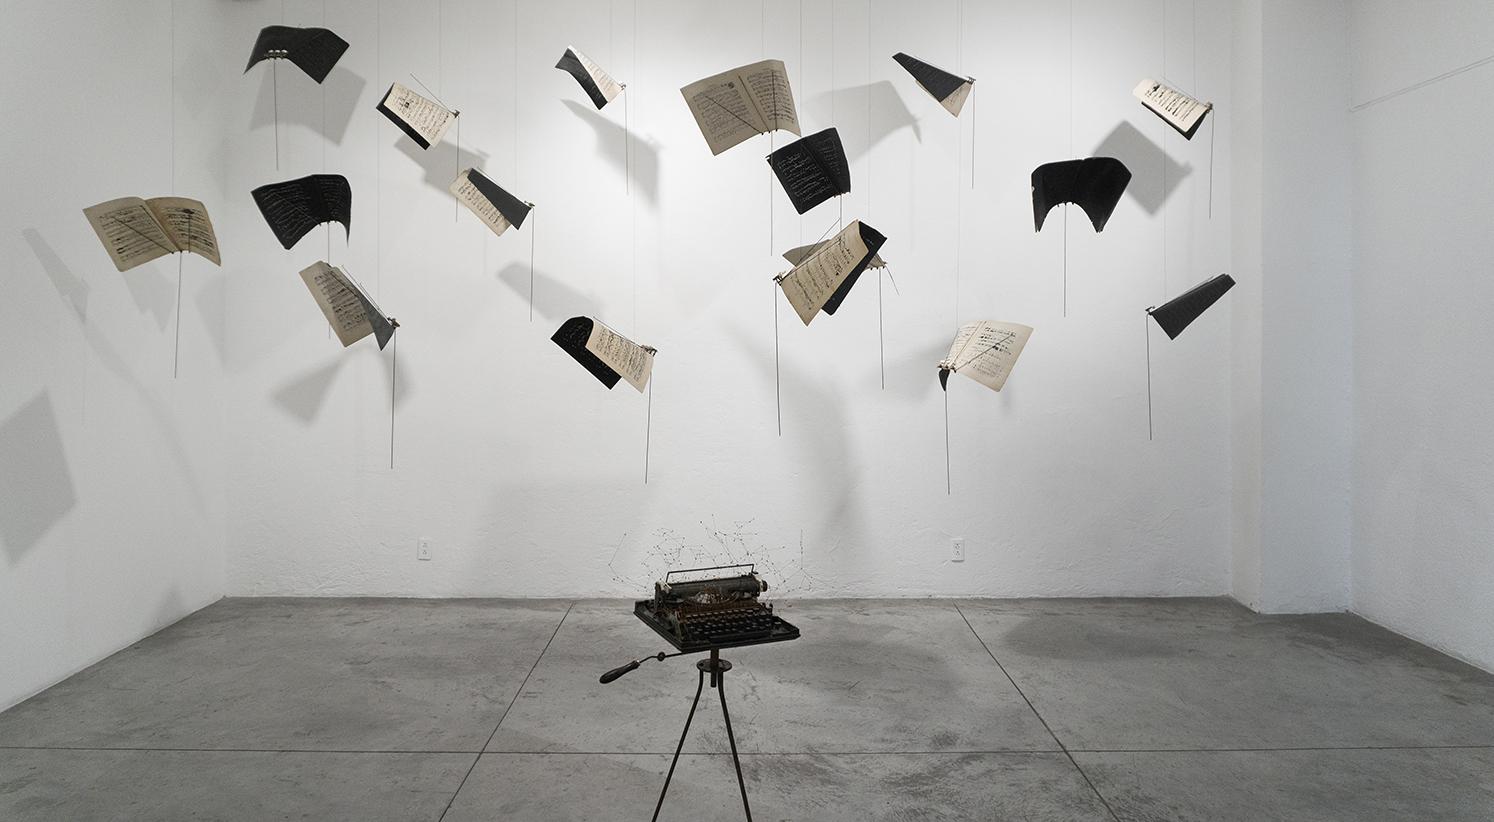 Puntos Luminosos, Verso IV (2017) - María Edwards